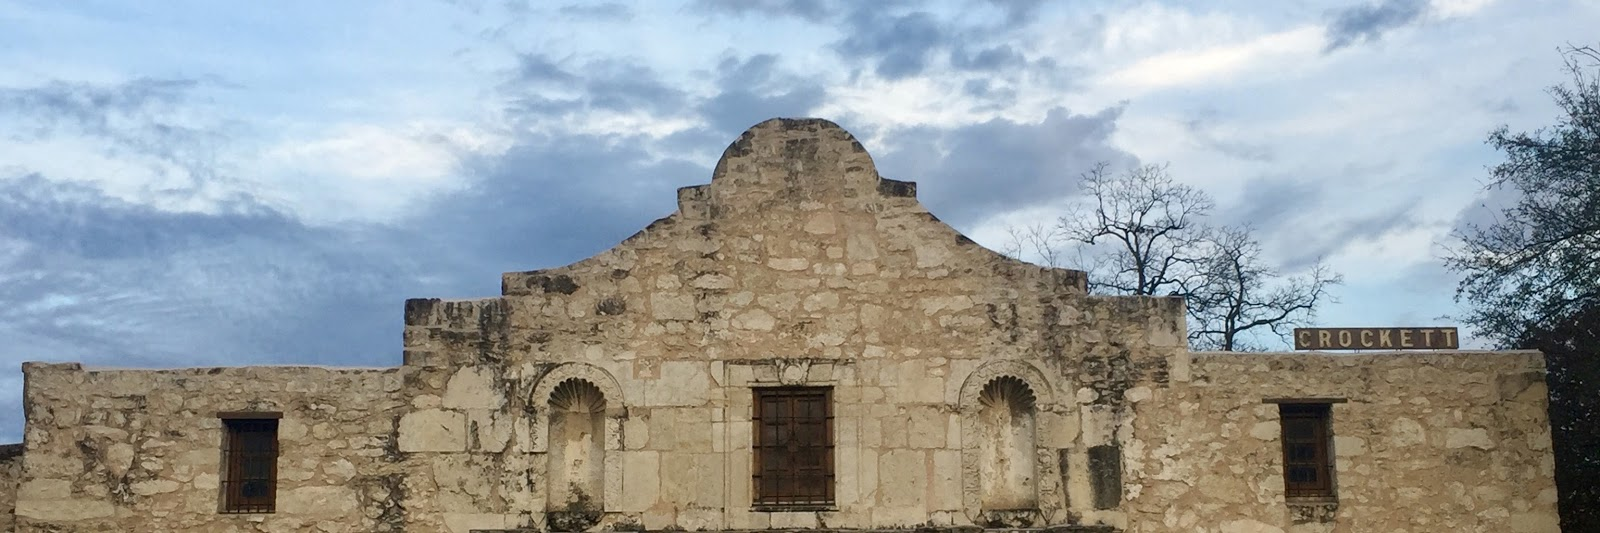 Austin San Antonio Fredericksburg New Braunfels Gruene Bandera